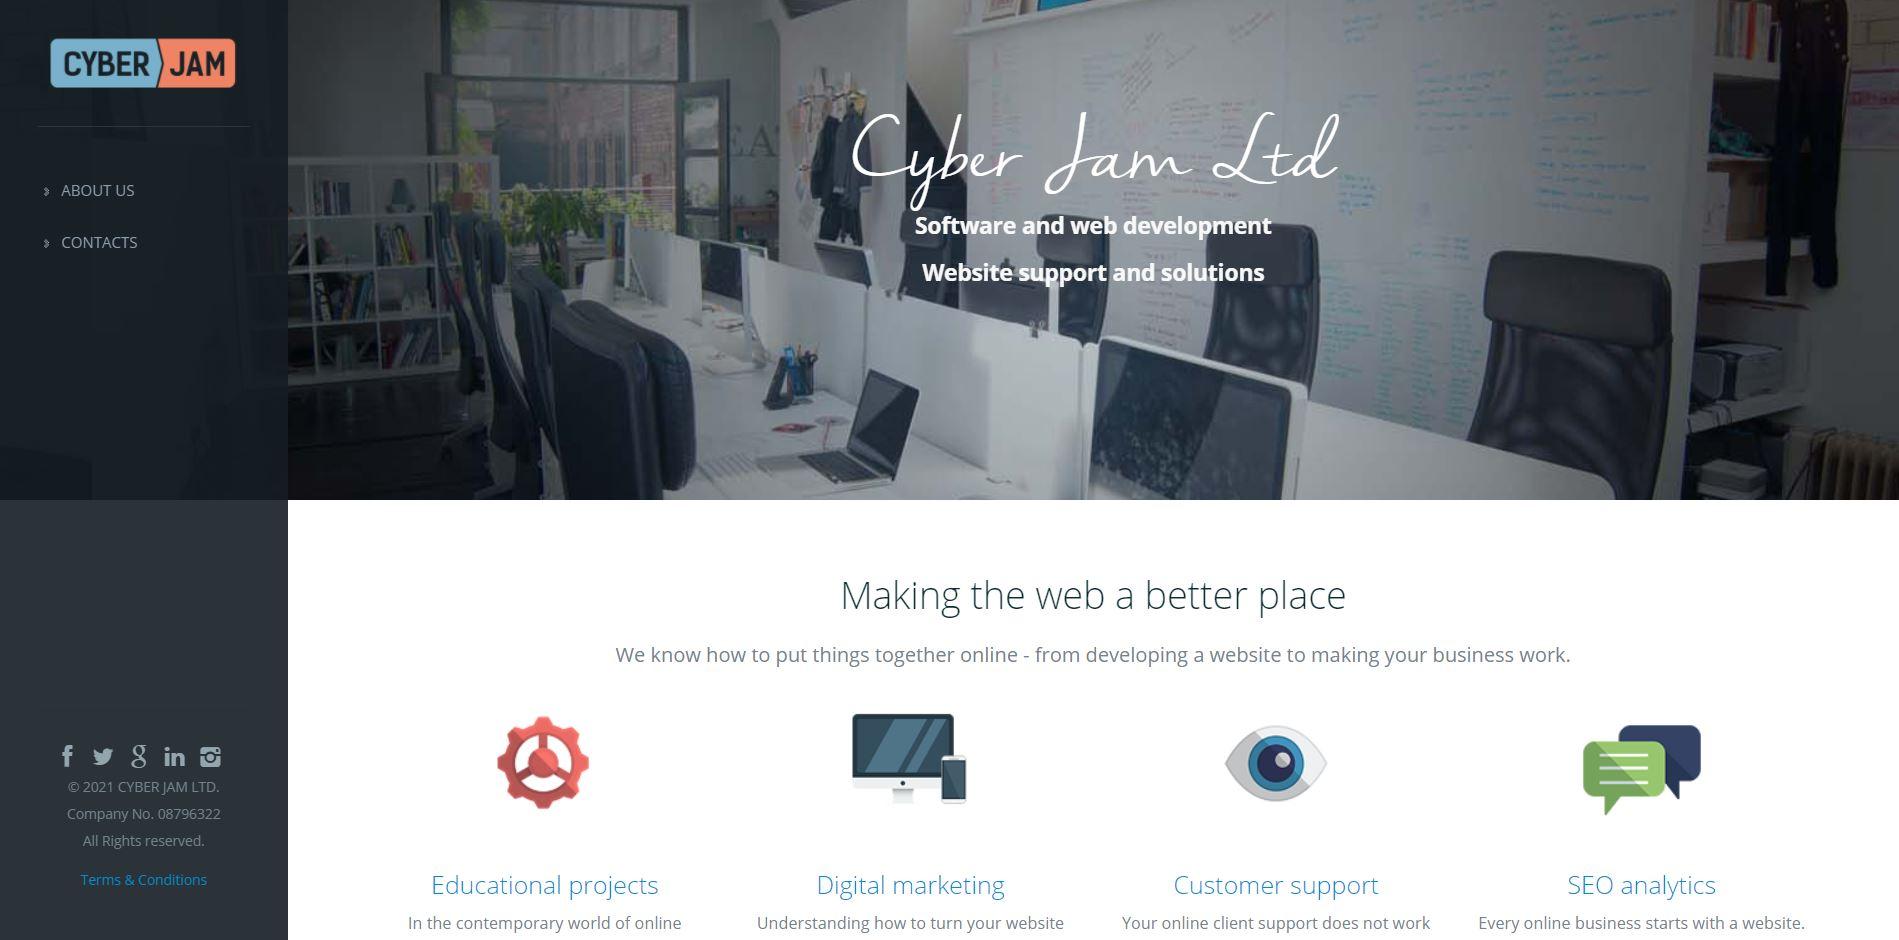 Cyber Jam Ltd. – Company Overview